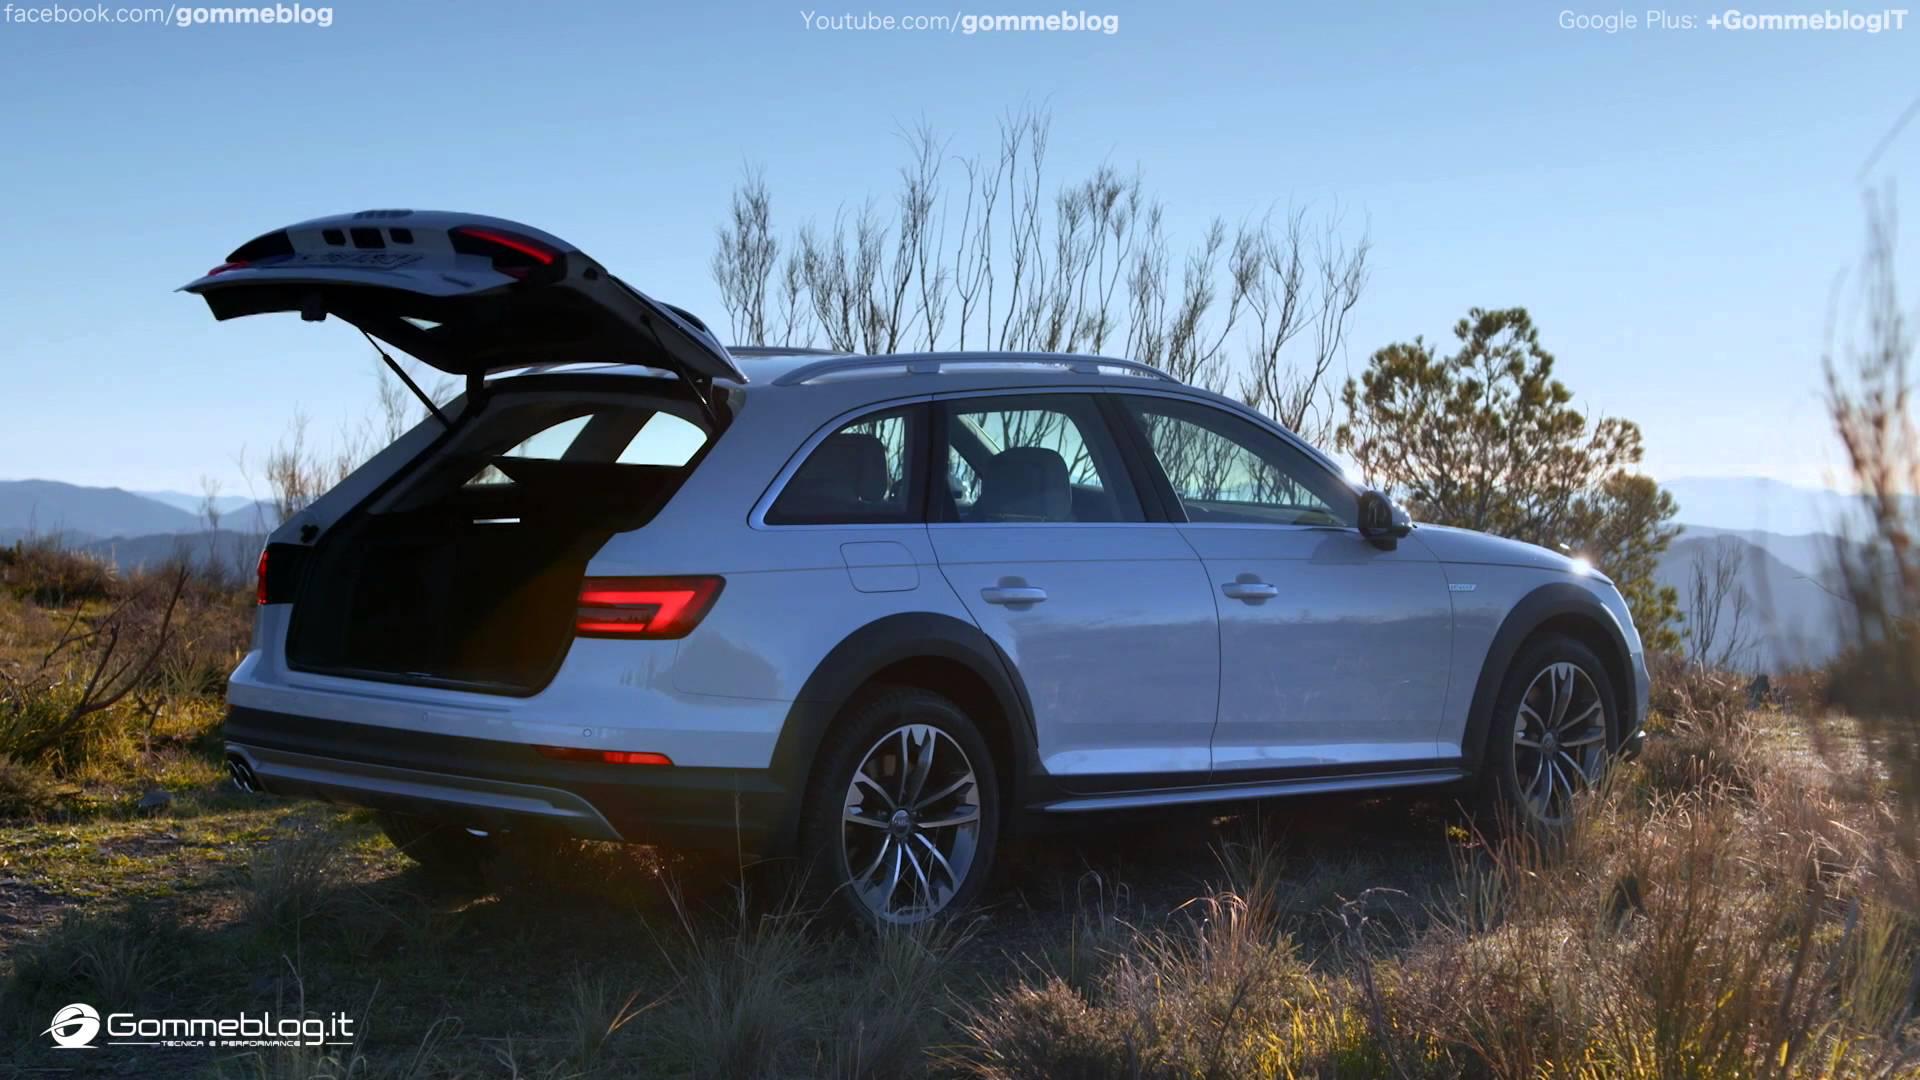 шины и диски для Audi A4 Allroad 2016 30 Tdi Quattro размер колёс